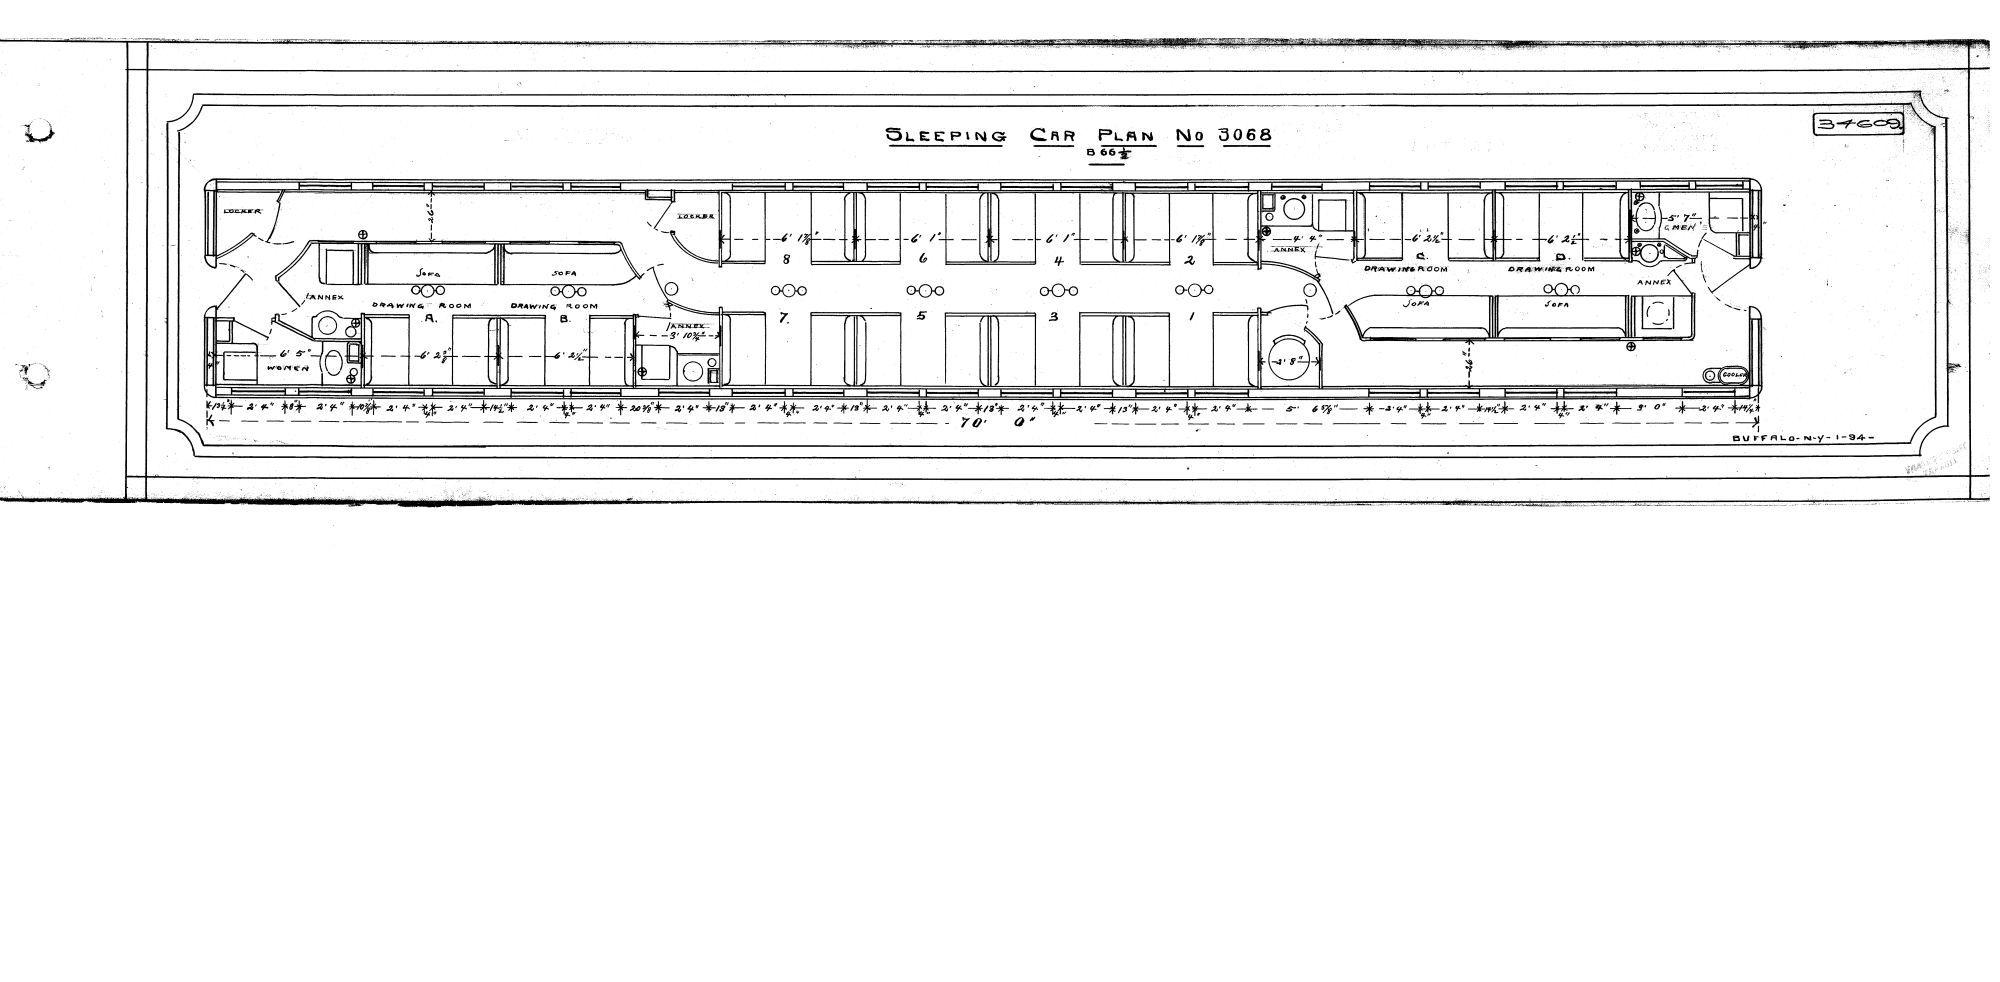 Passenger train sleeping car cutaway illustration google search passenger train sleeping car cutaway illustration google search malvernweather Choice Image